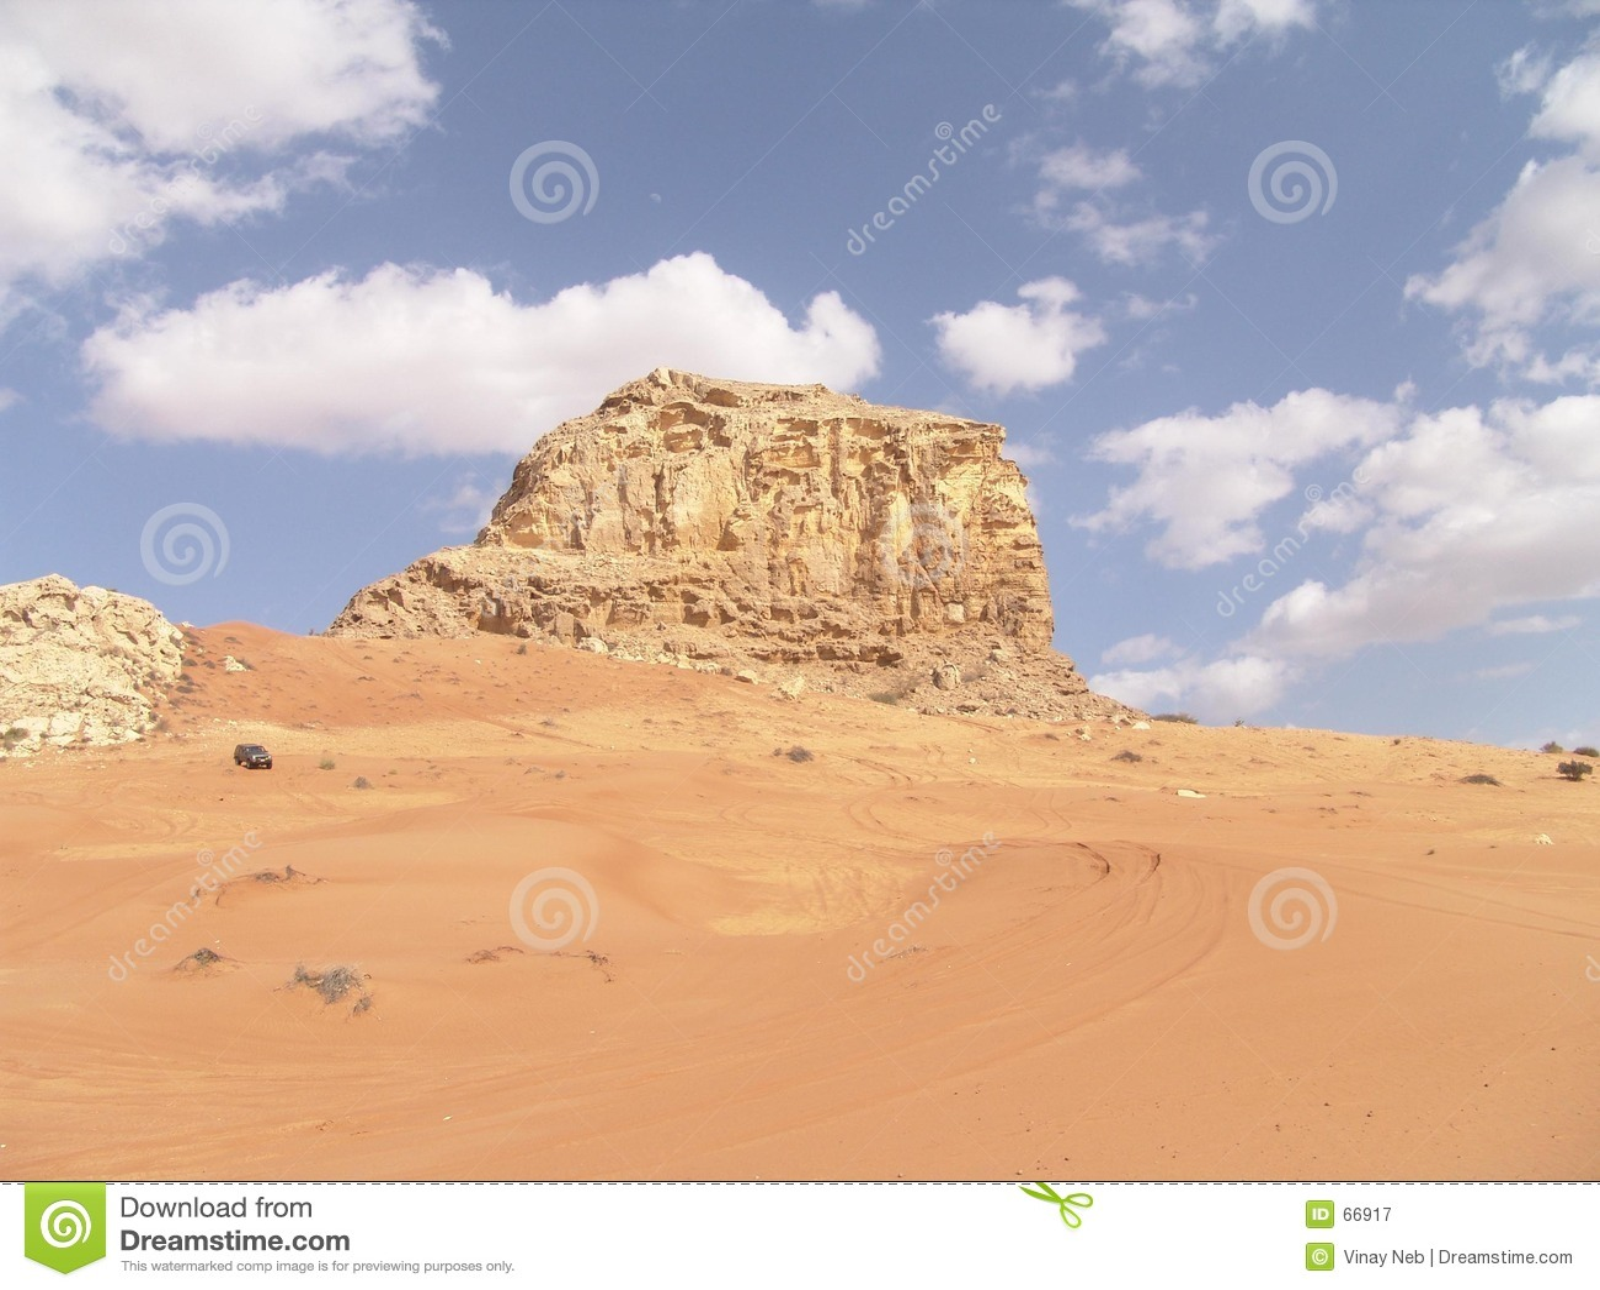 Fossil- rock